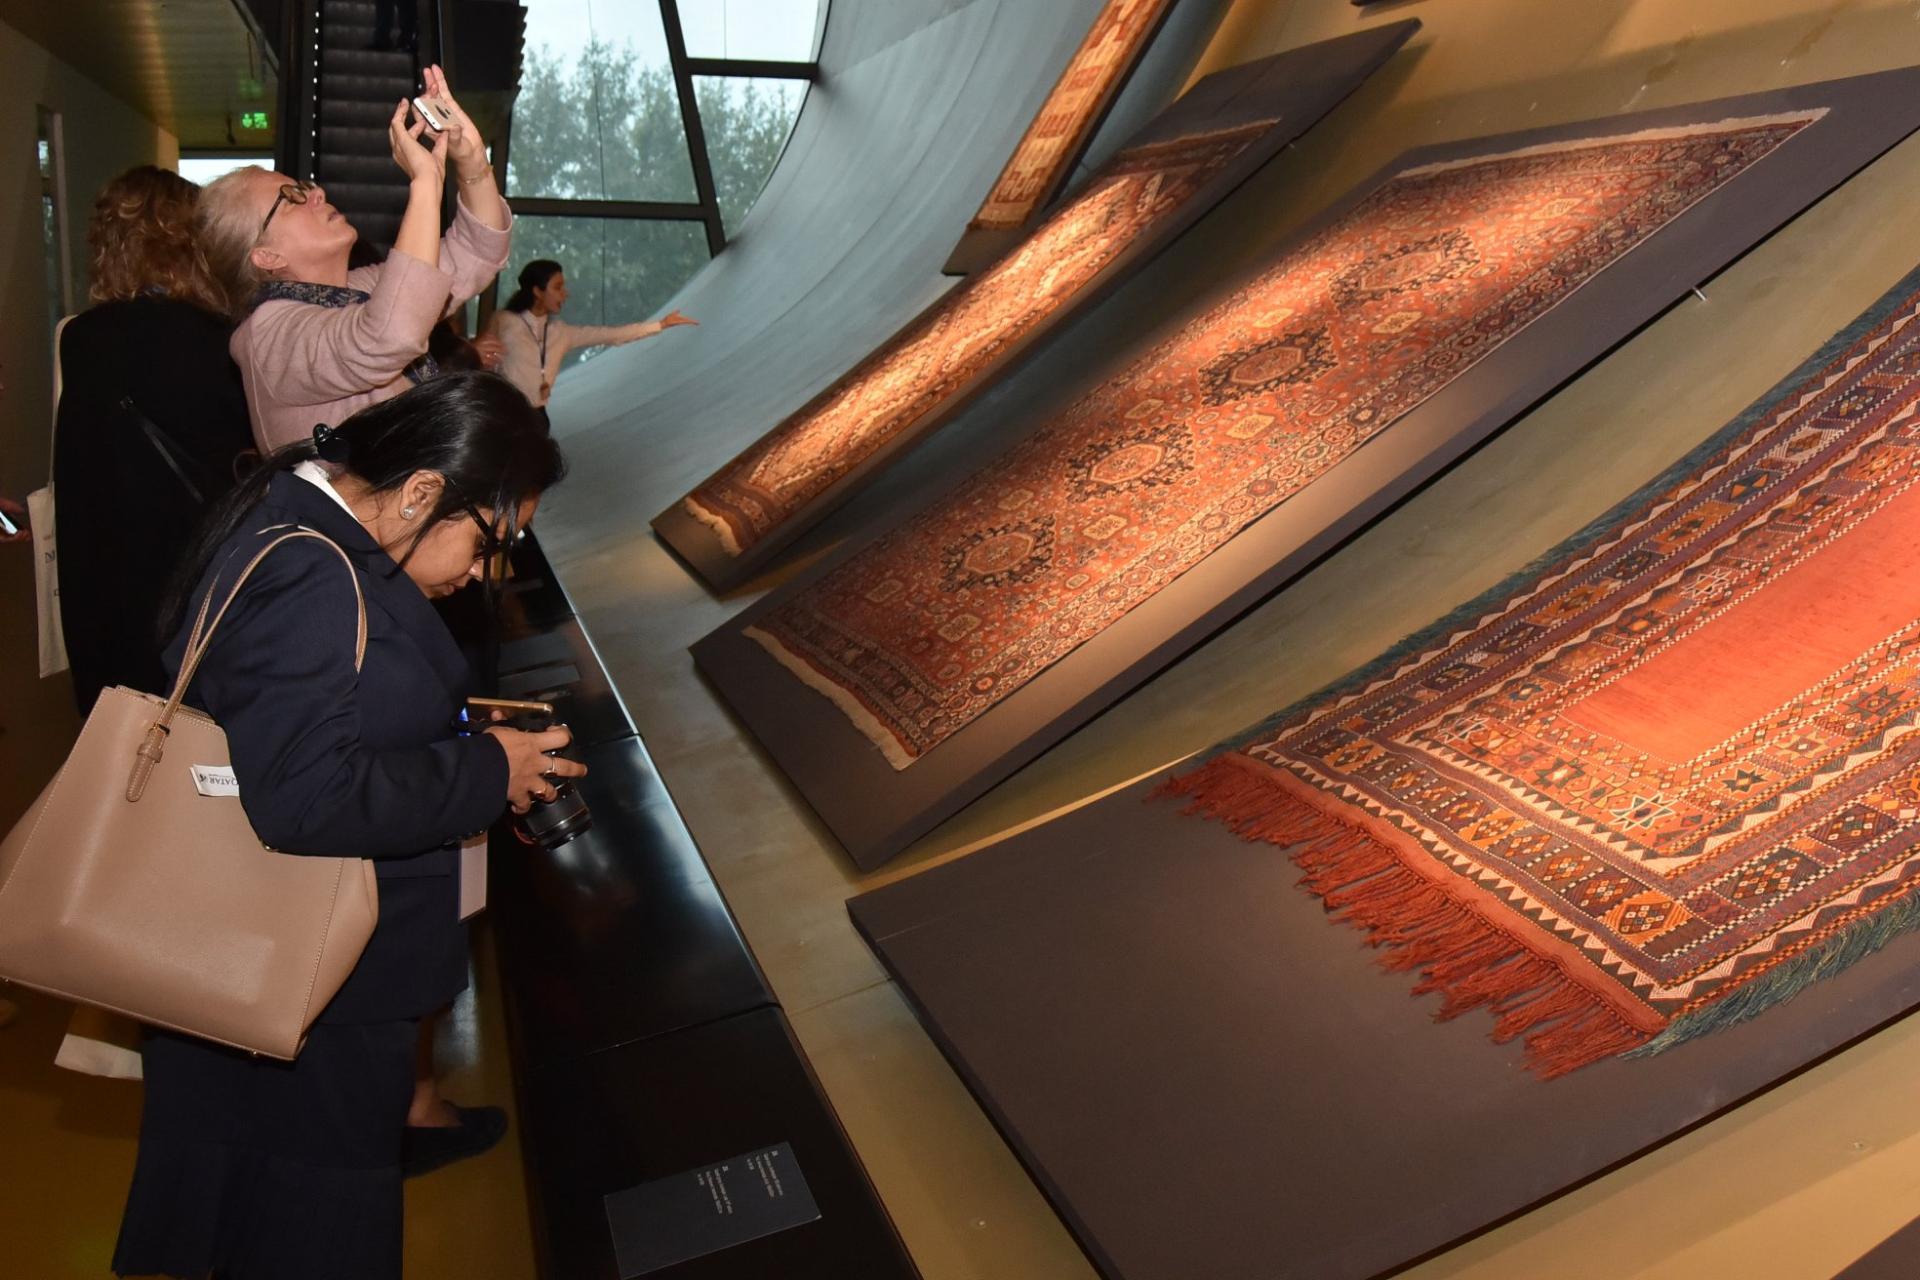 Хелена Кенигсмаркова: Азербайджанский музей ковра - музей моей мечты (ФОТО)